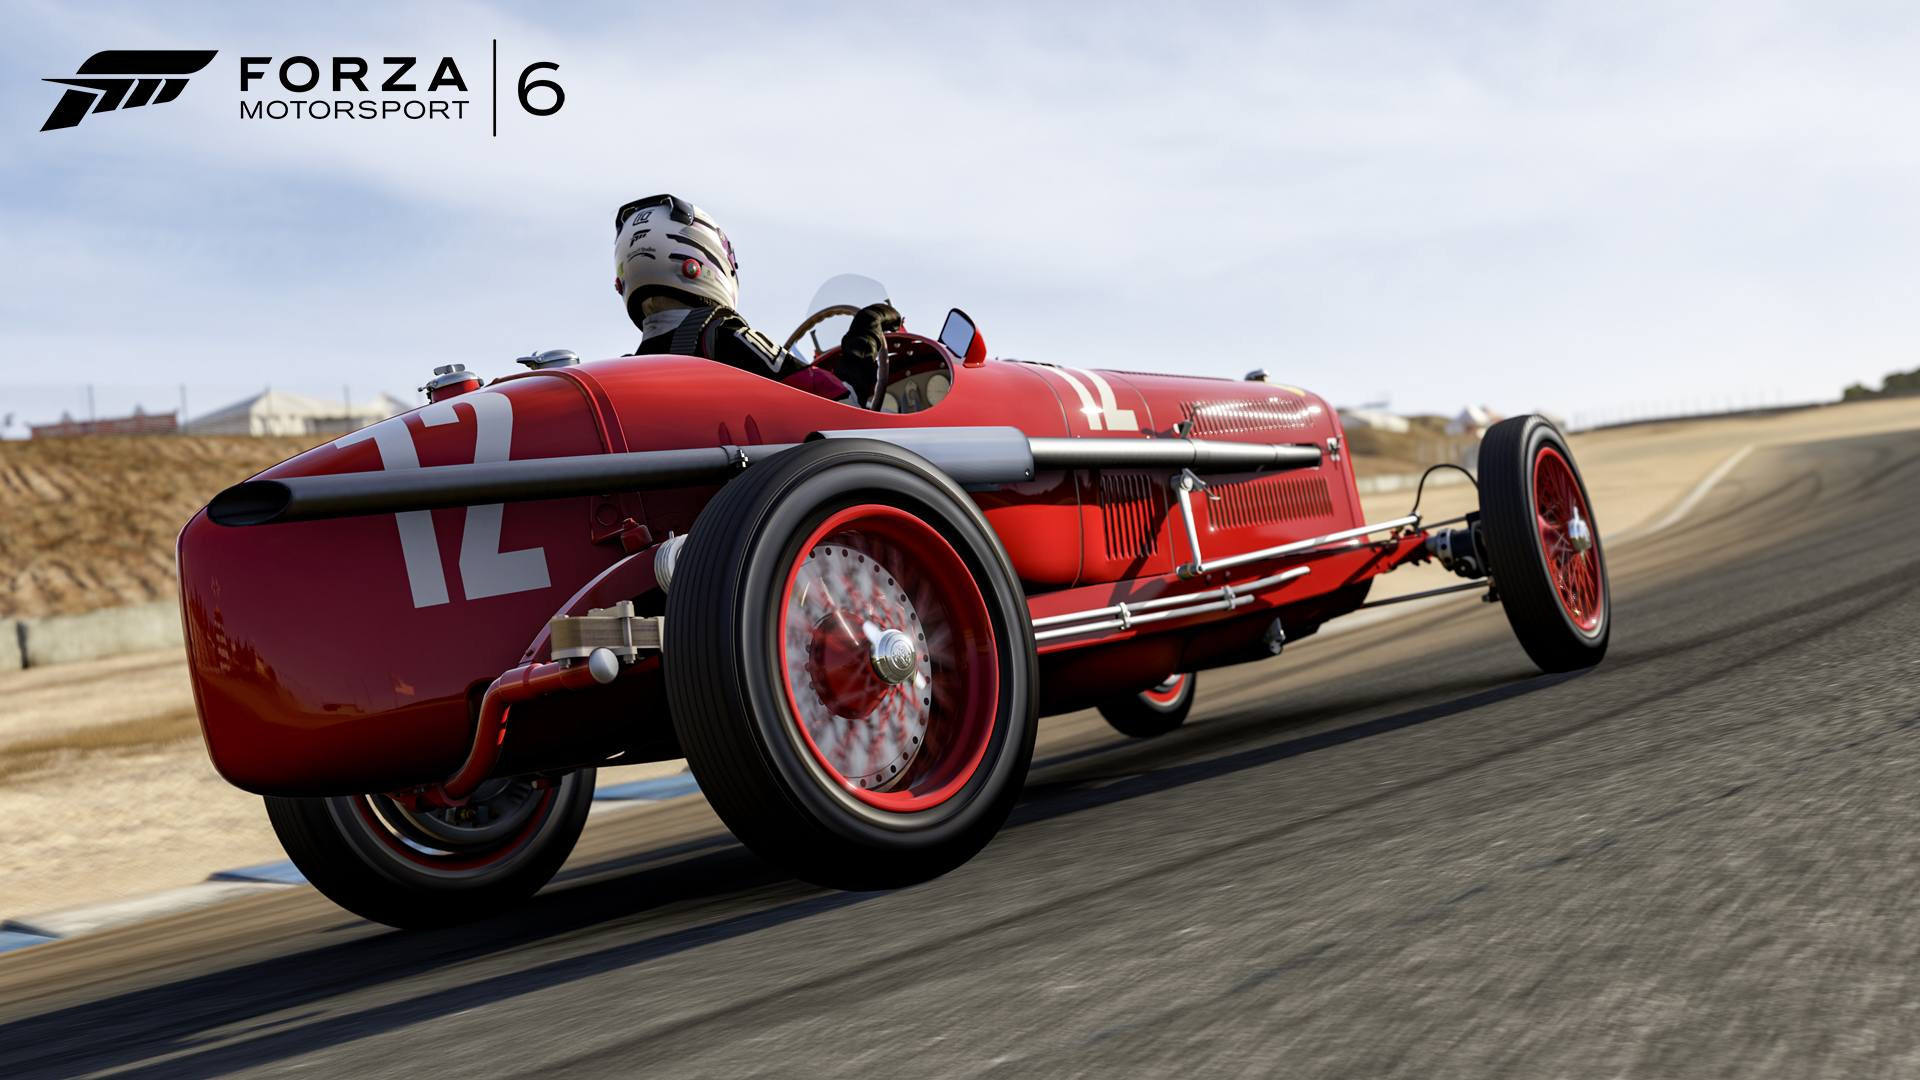 Forza Motorsport 6 14-03-16 1934 Alfa Romeo P3 001